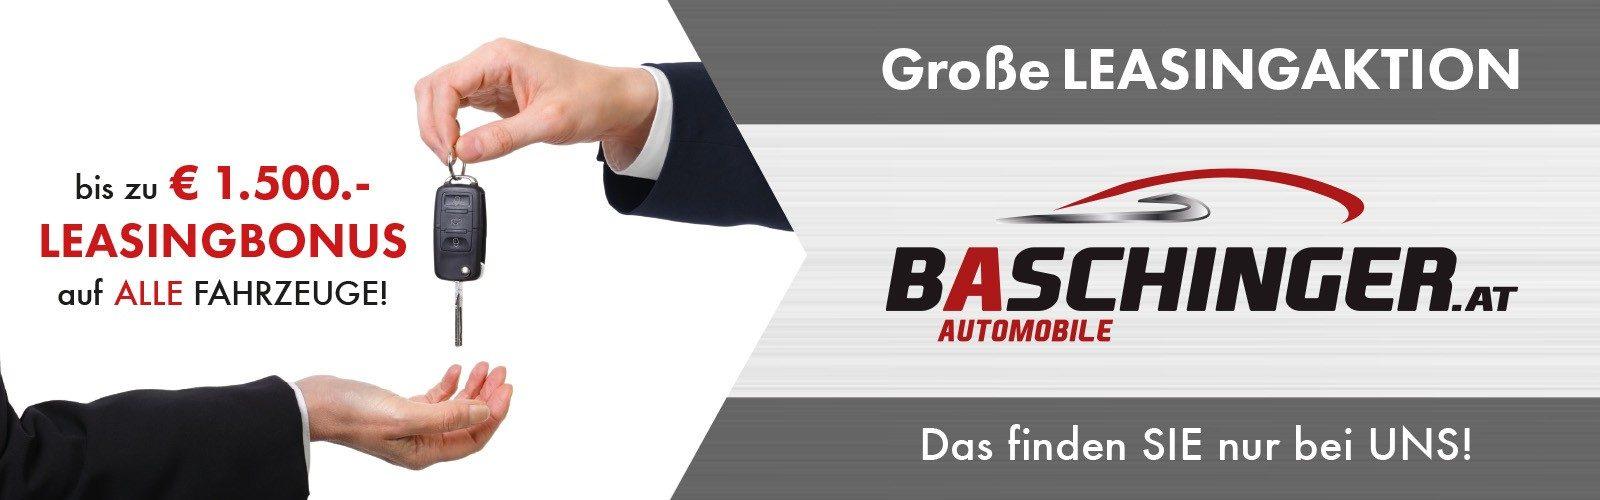 BASCHINGER LEASING bei HWS || Ing. Günther Baschinger GmbH in